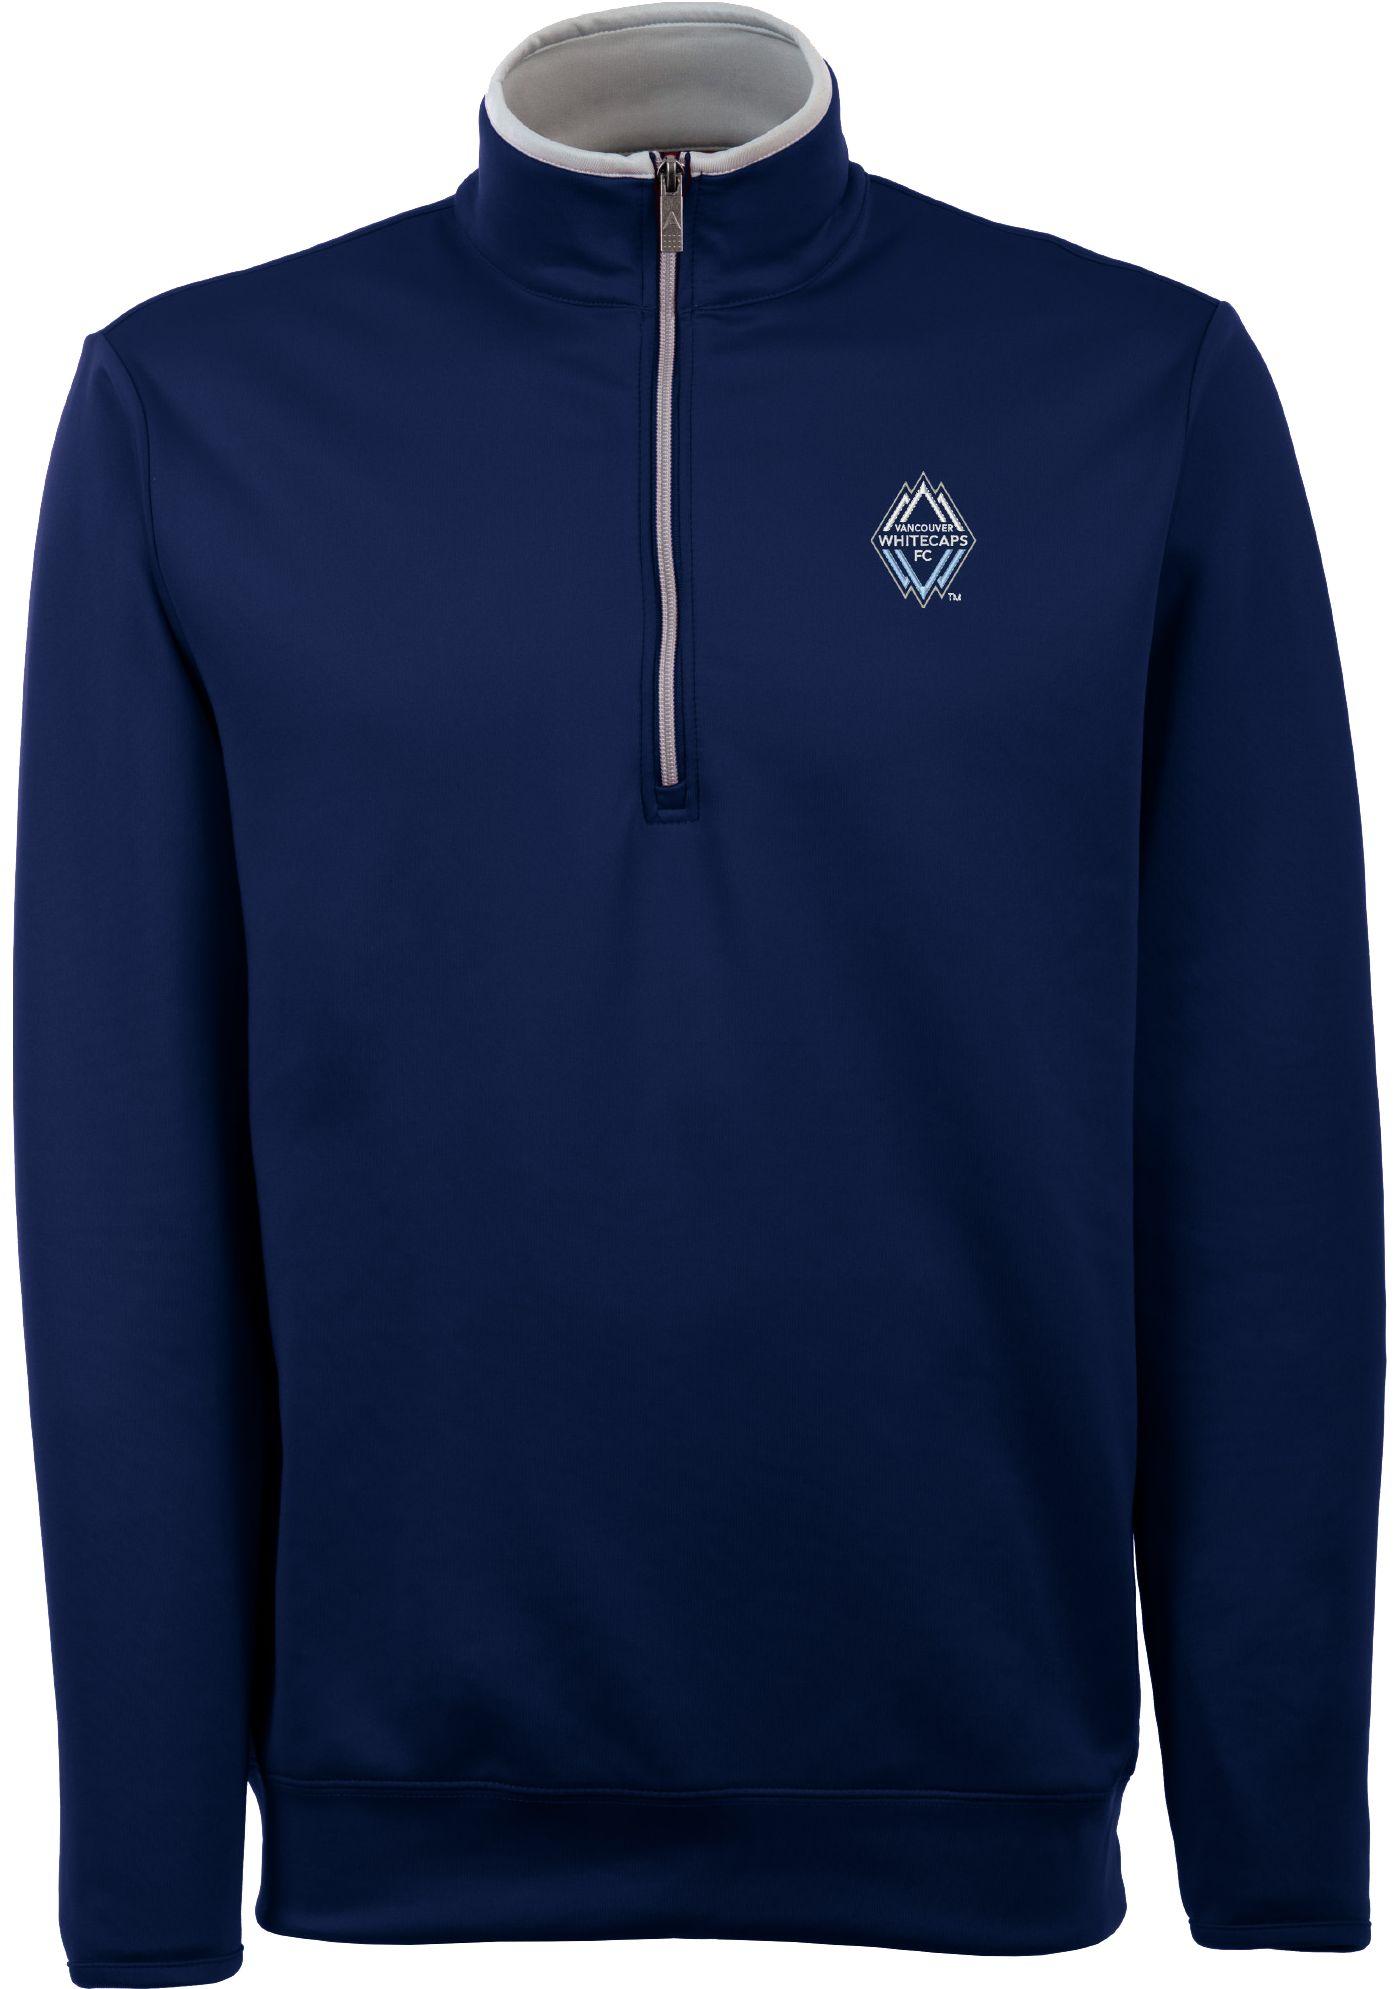 Antigua Men's Vancouver Whitecaps Leader Navy Quarter-Zip Jacket